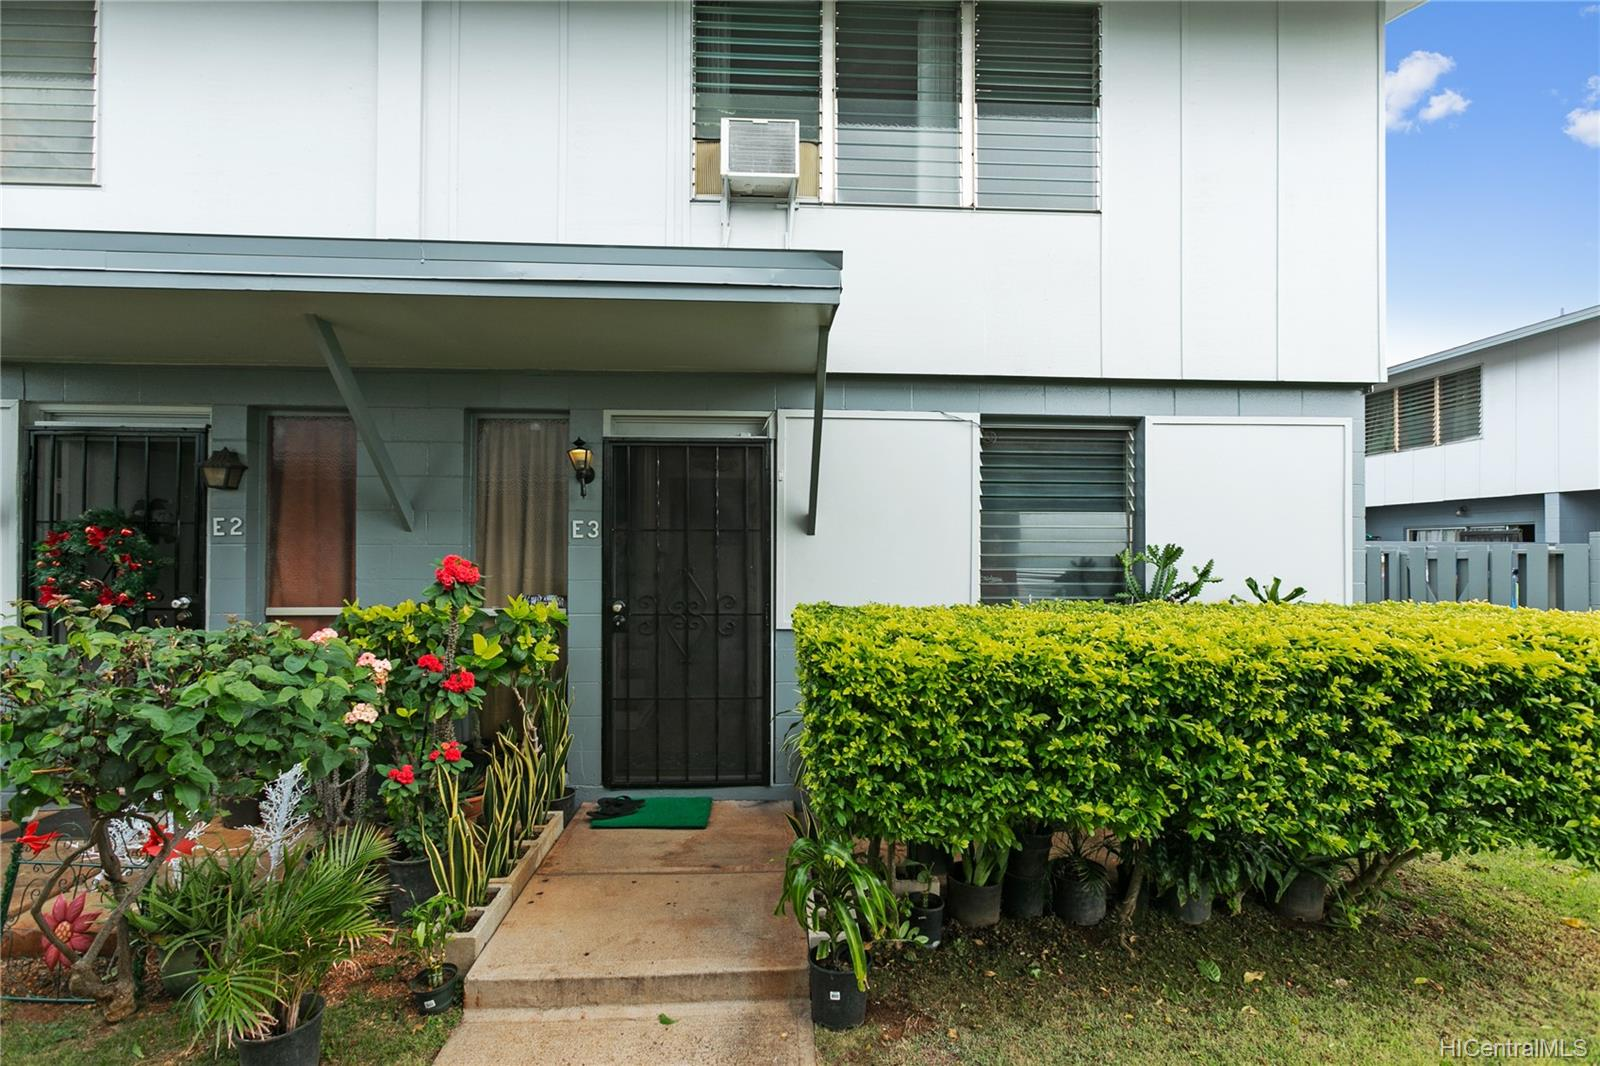 91-917 North Road townhouse # E-3, Ewa Beach, Hawaii - photo 1 of 14